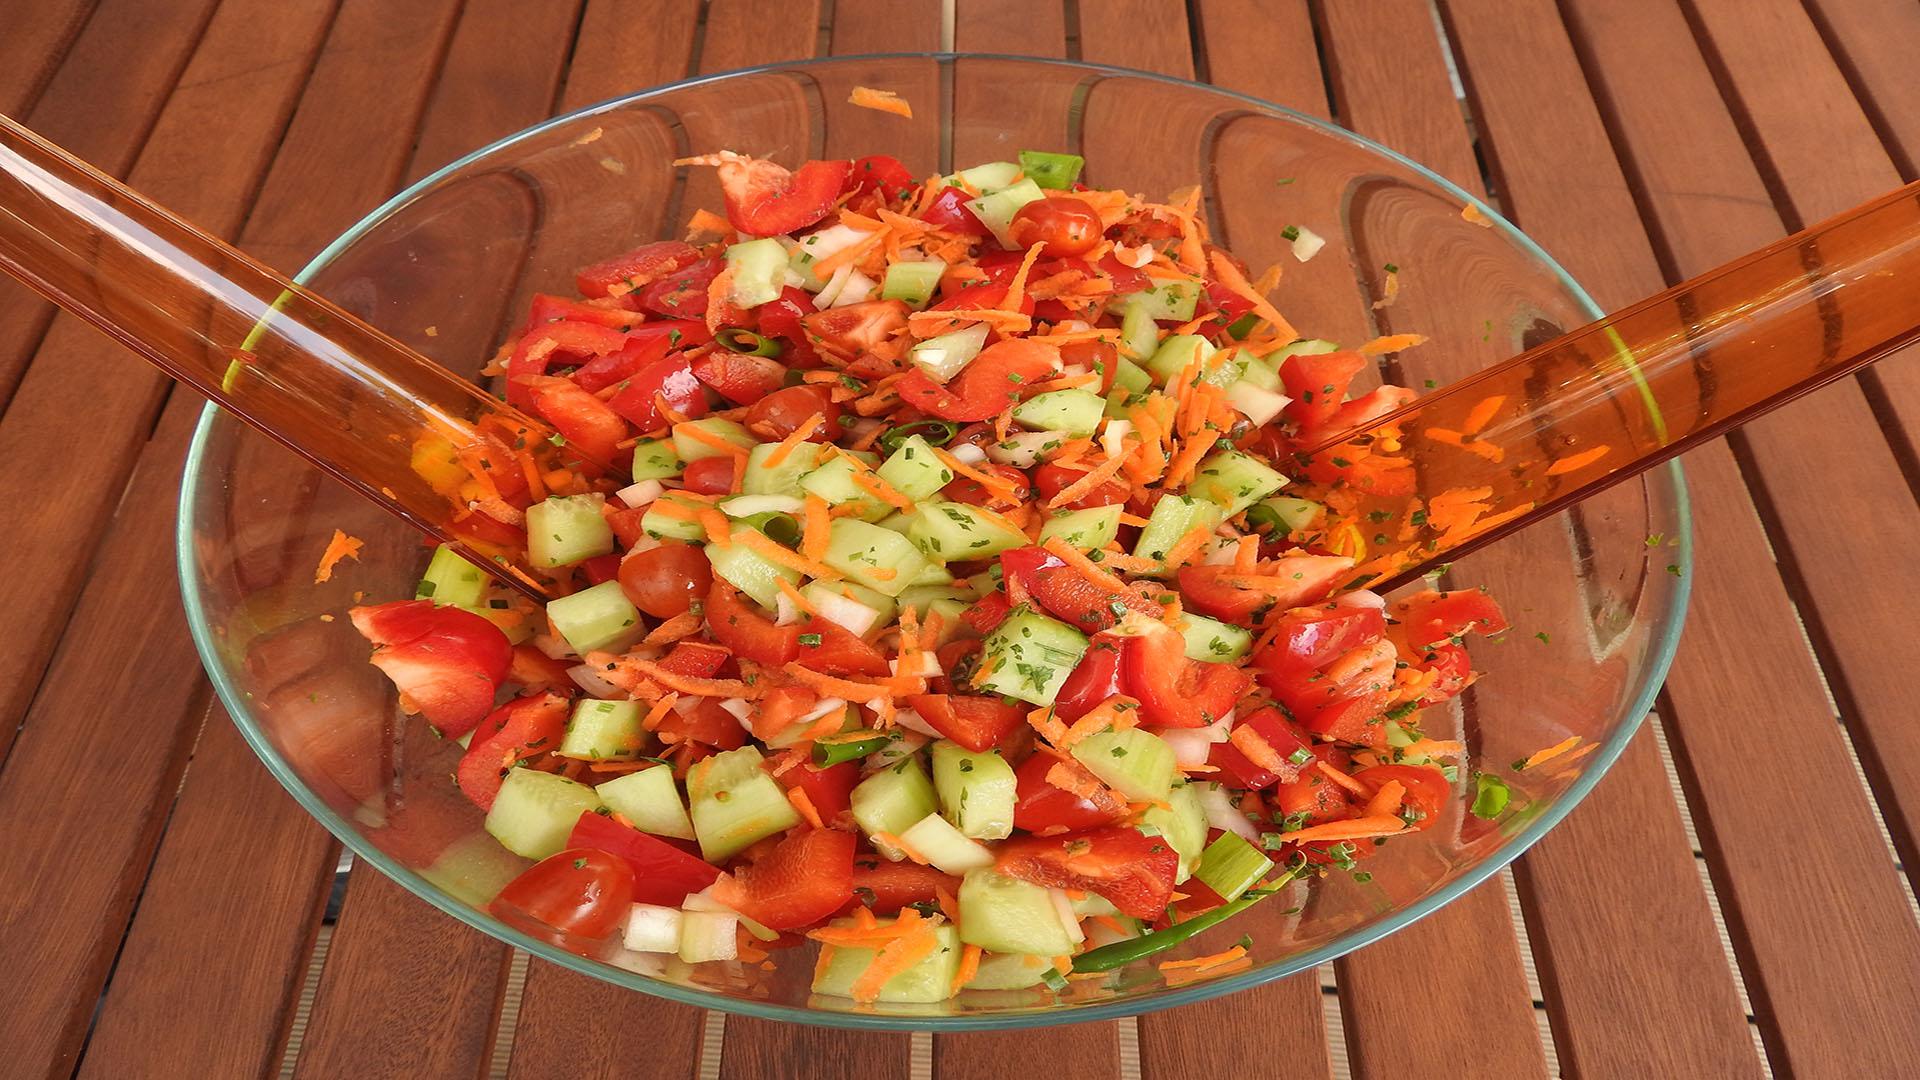 Kunterbunter Gemüsesalat auf Kochen-verstehen.de